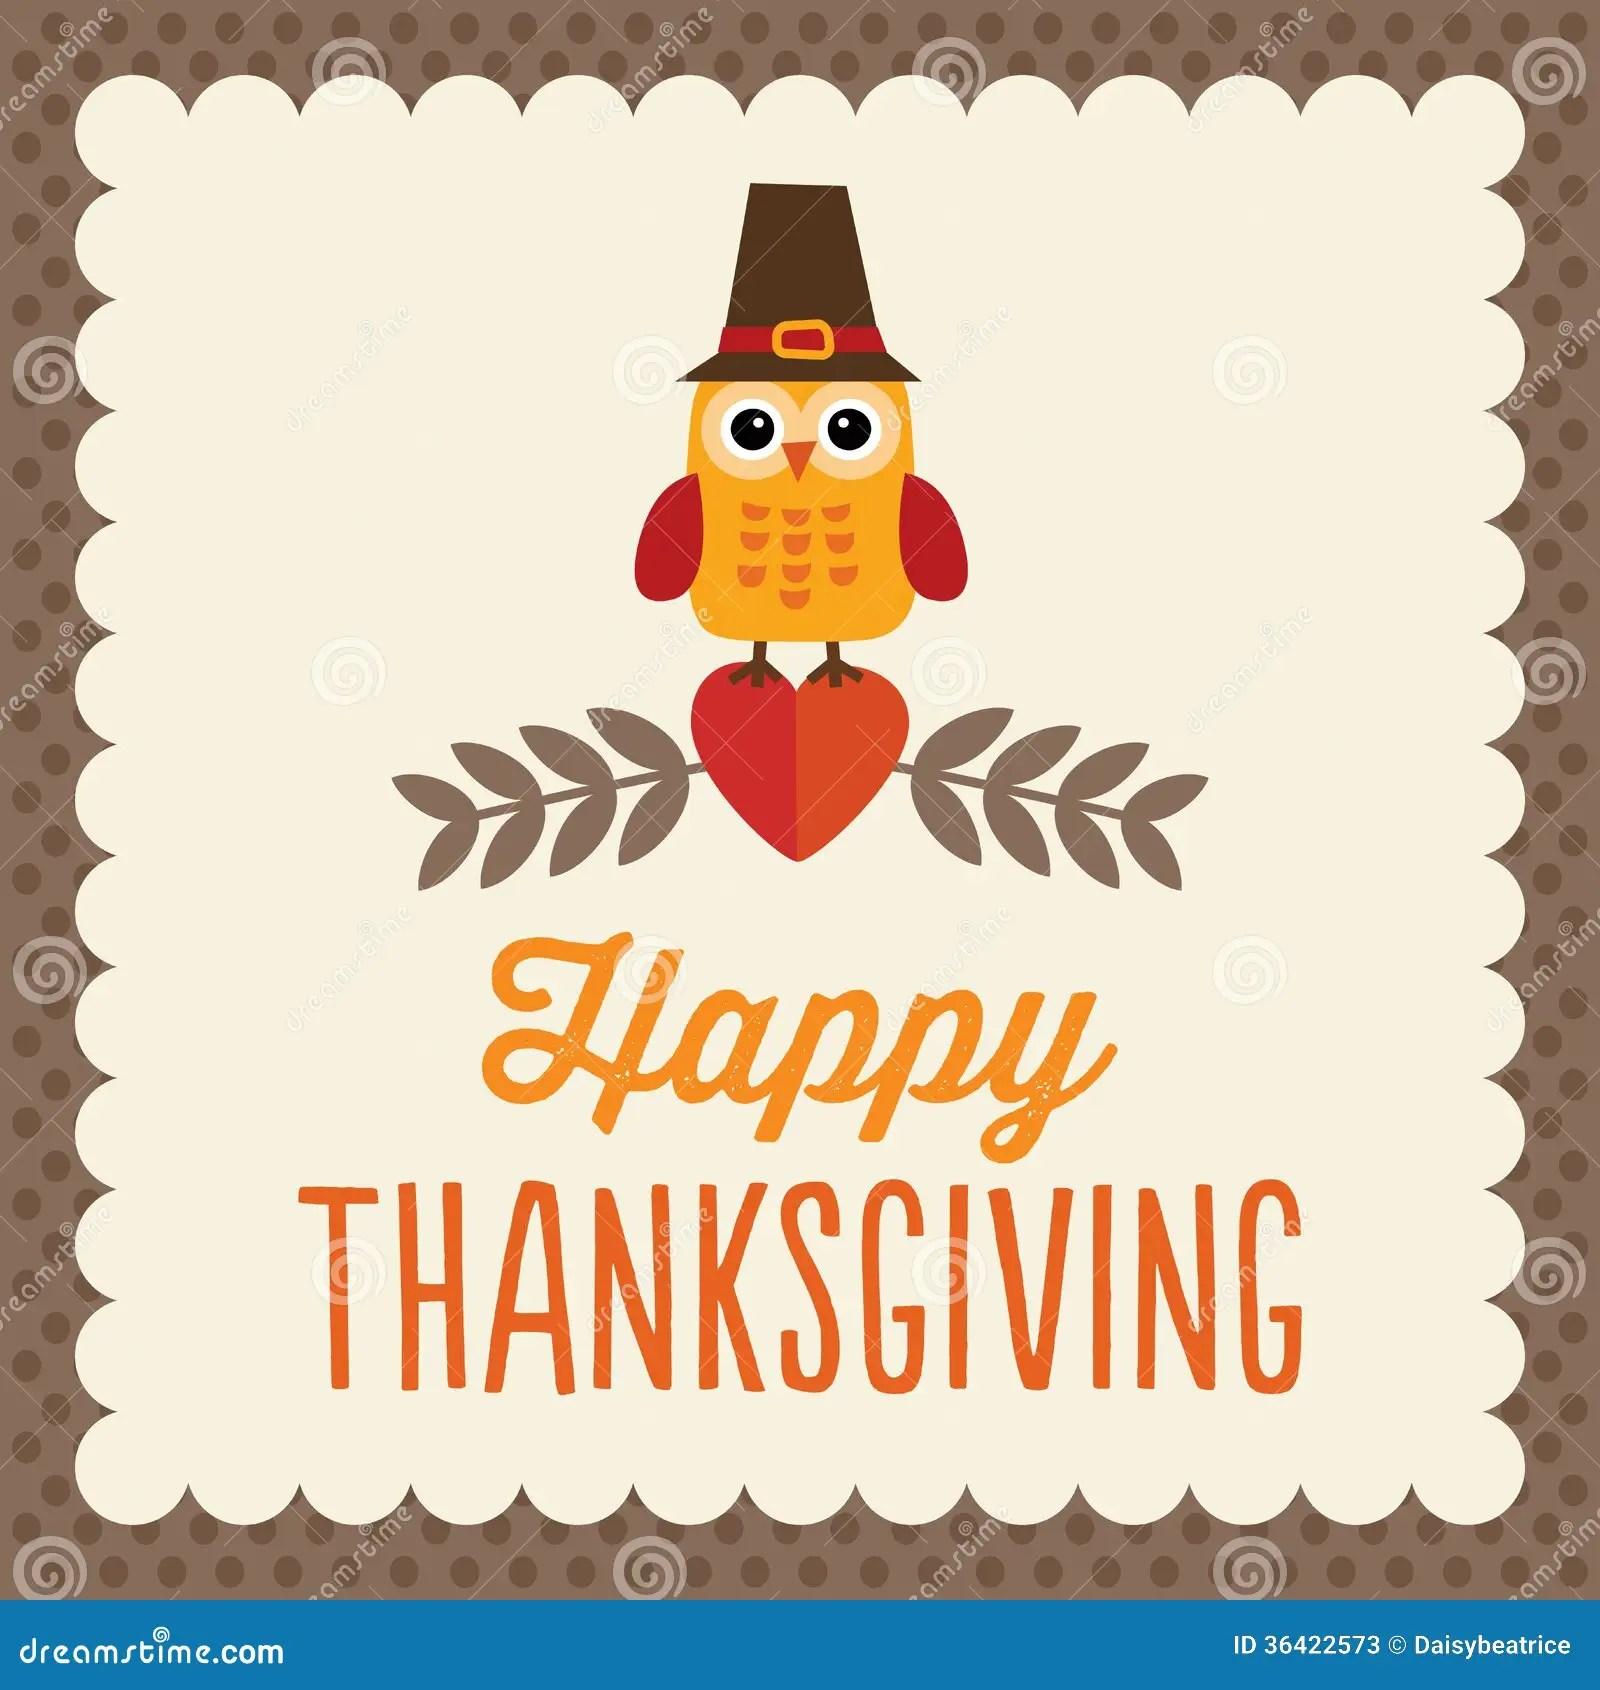 Free Fall Themed Desktop Wallpaper Cute Thanksgiving Card Stock Photos Image 36422573